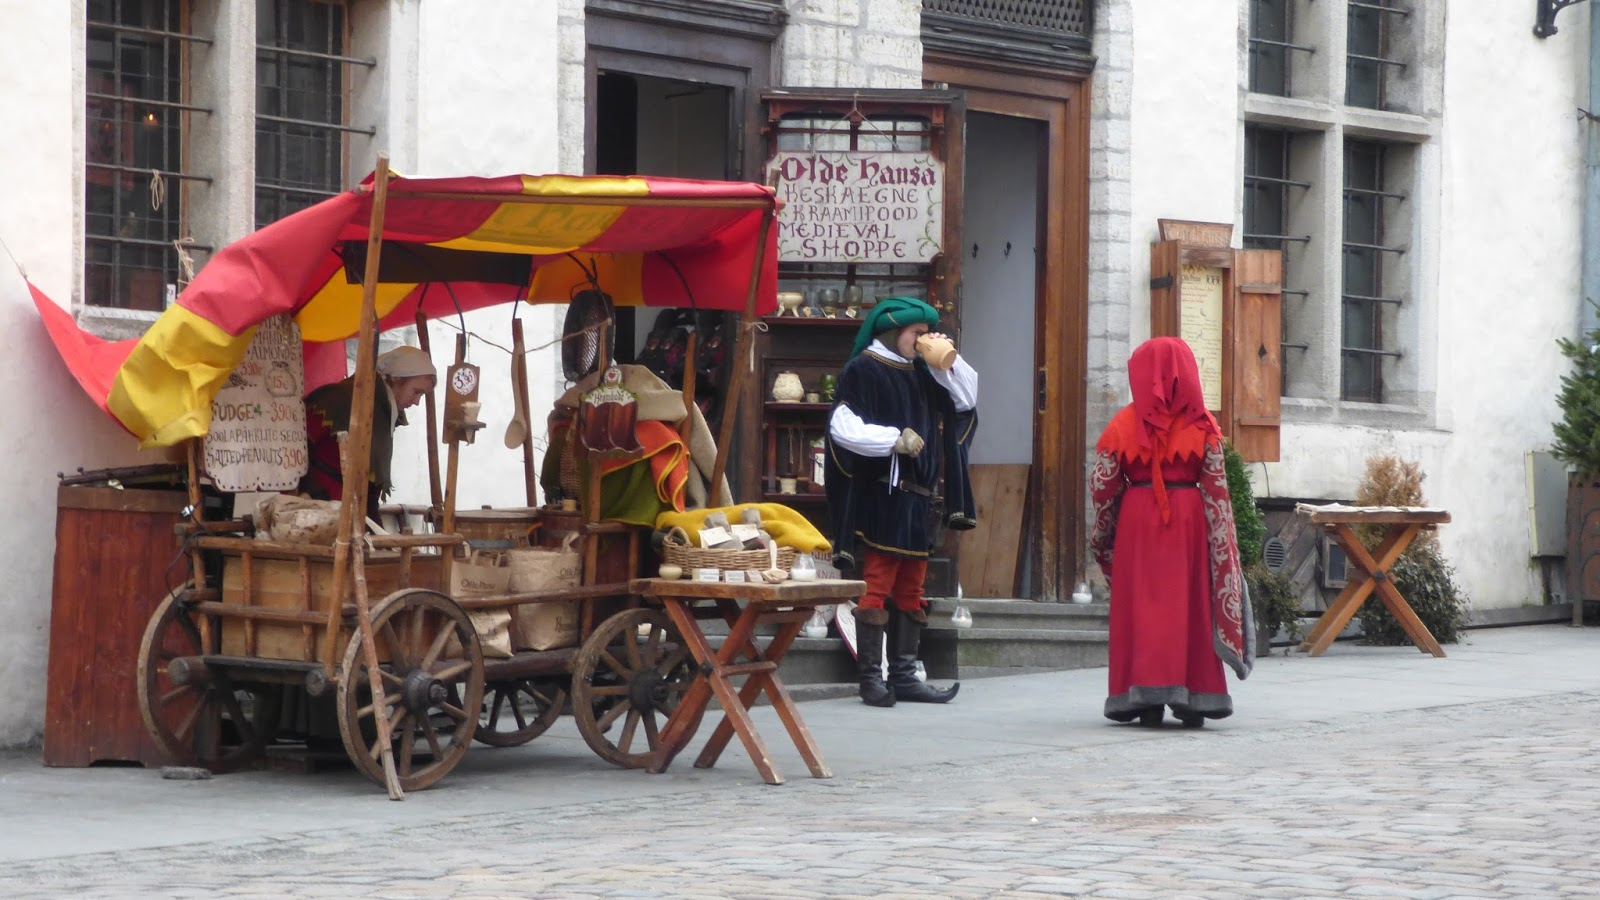 The medieval Old Town centre of Tallinn, Estonia